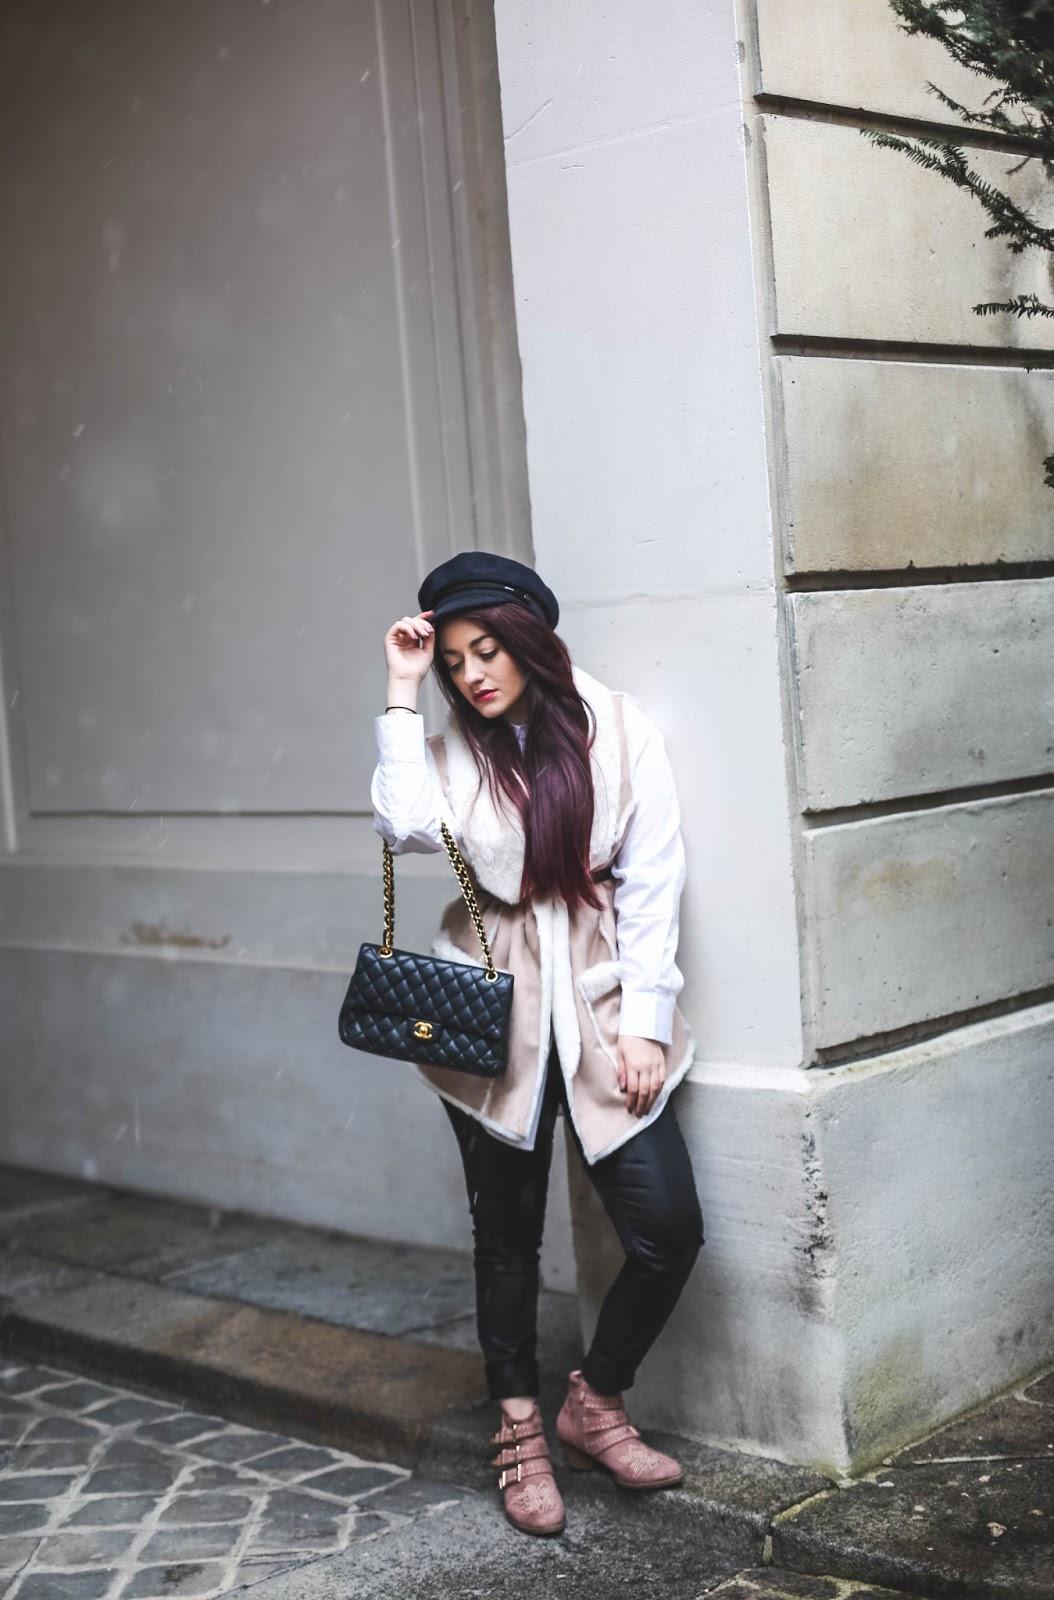 sac Chanel venus is naive blog mode